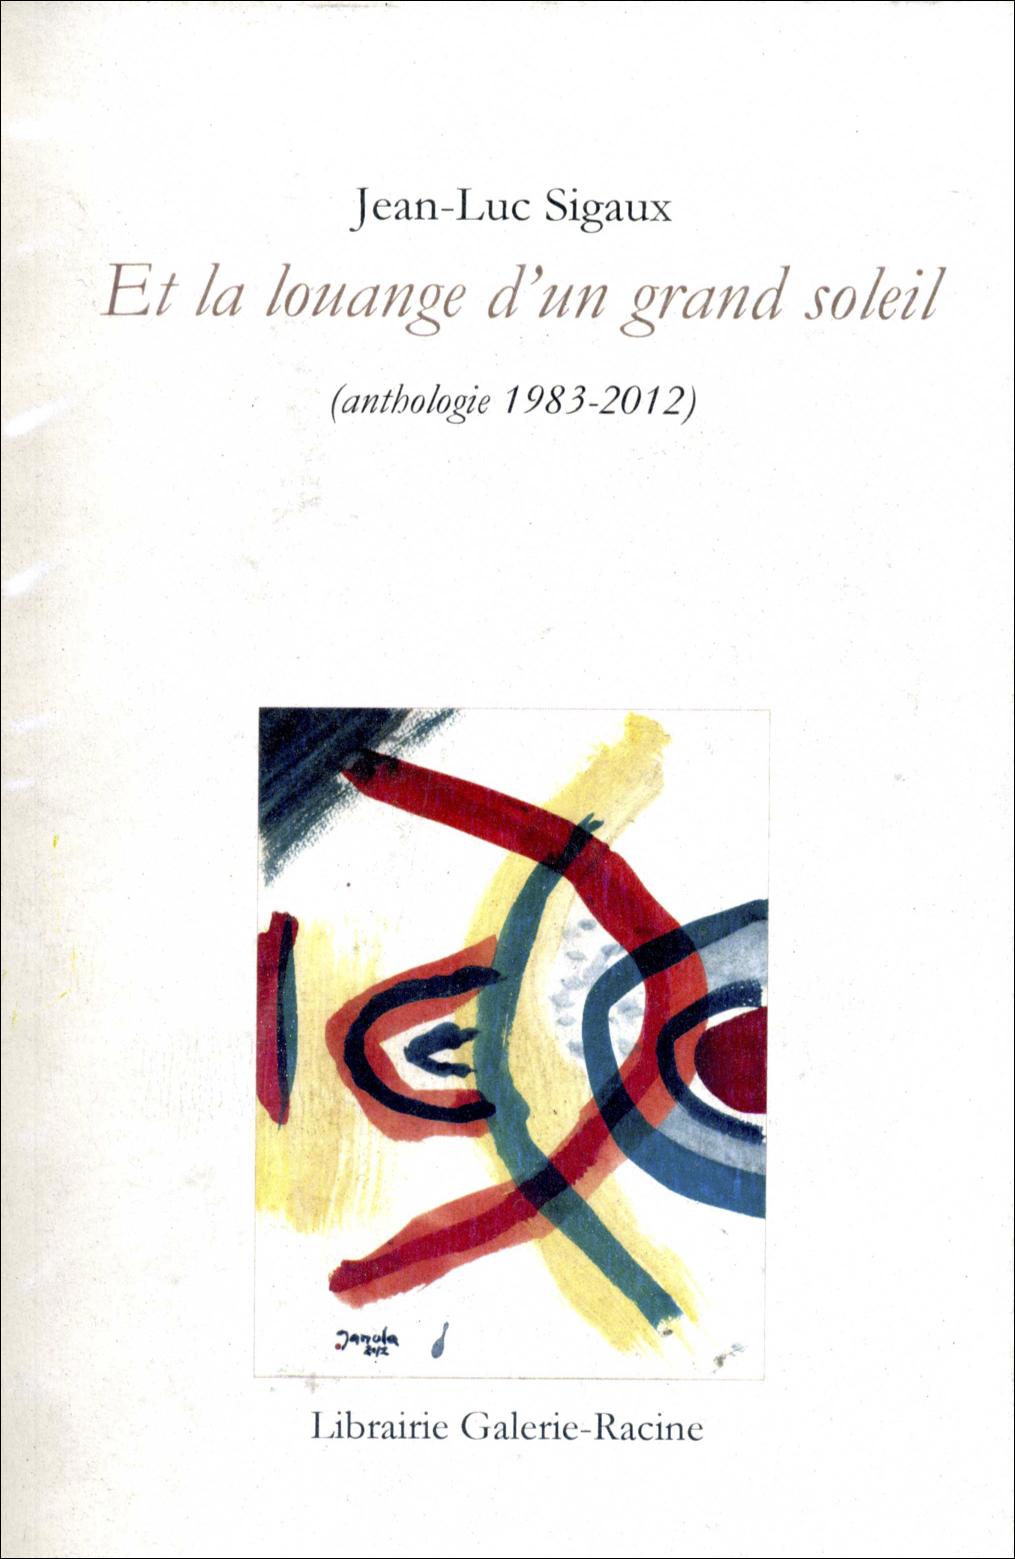 Jean-Luc Sigaux - anthologie